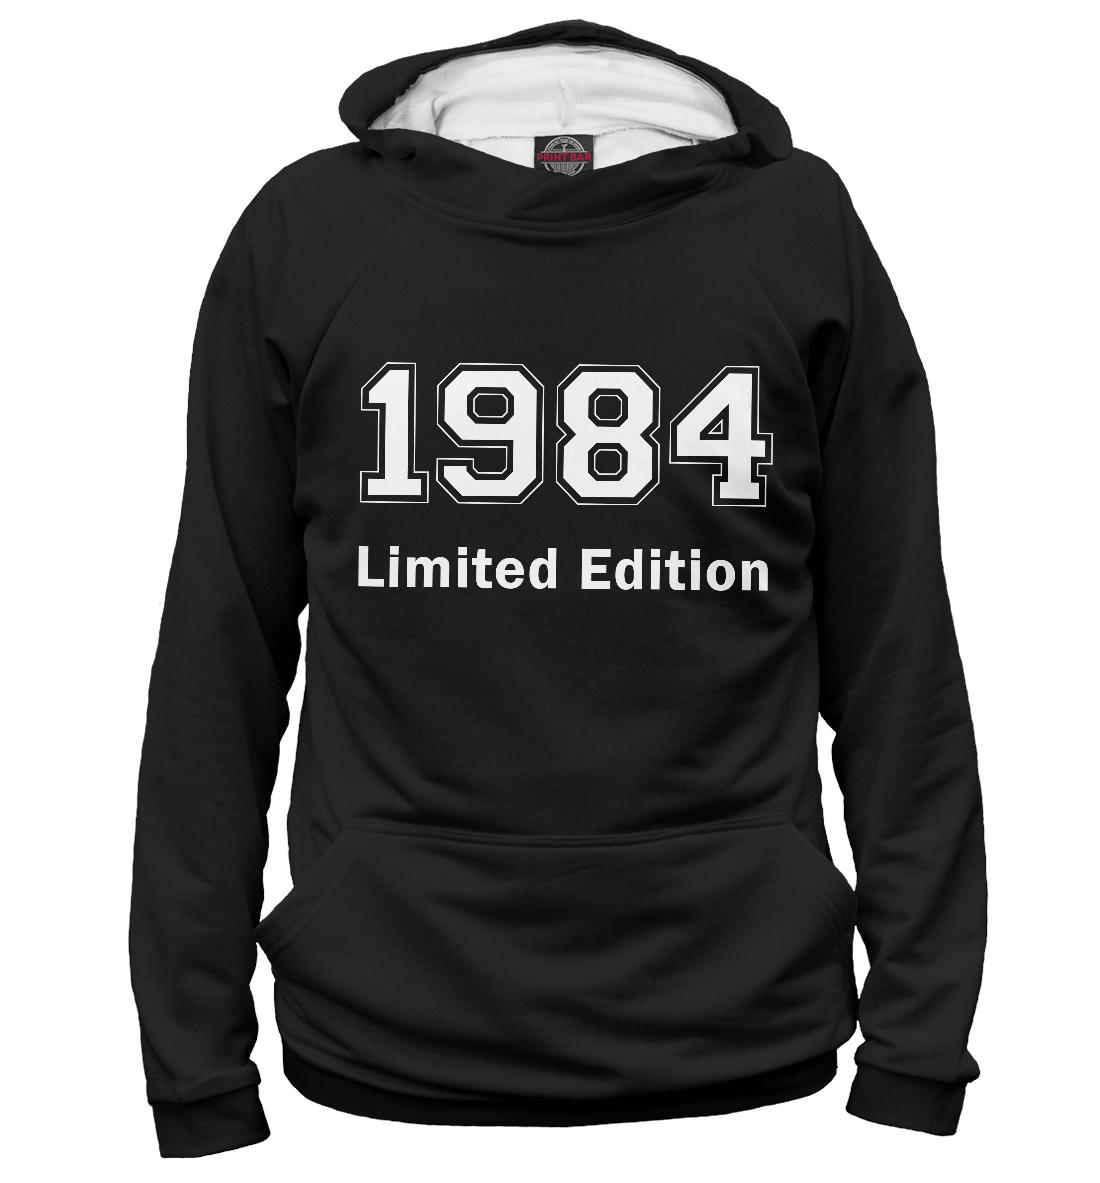 1984 Limited Edition, Printbar, Худи, DVC-465851-hud-2  - купить со скидкой